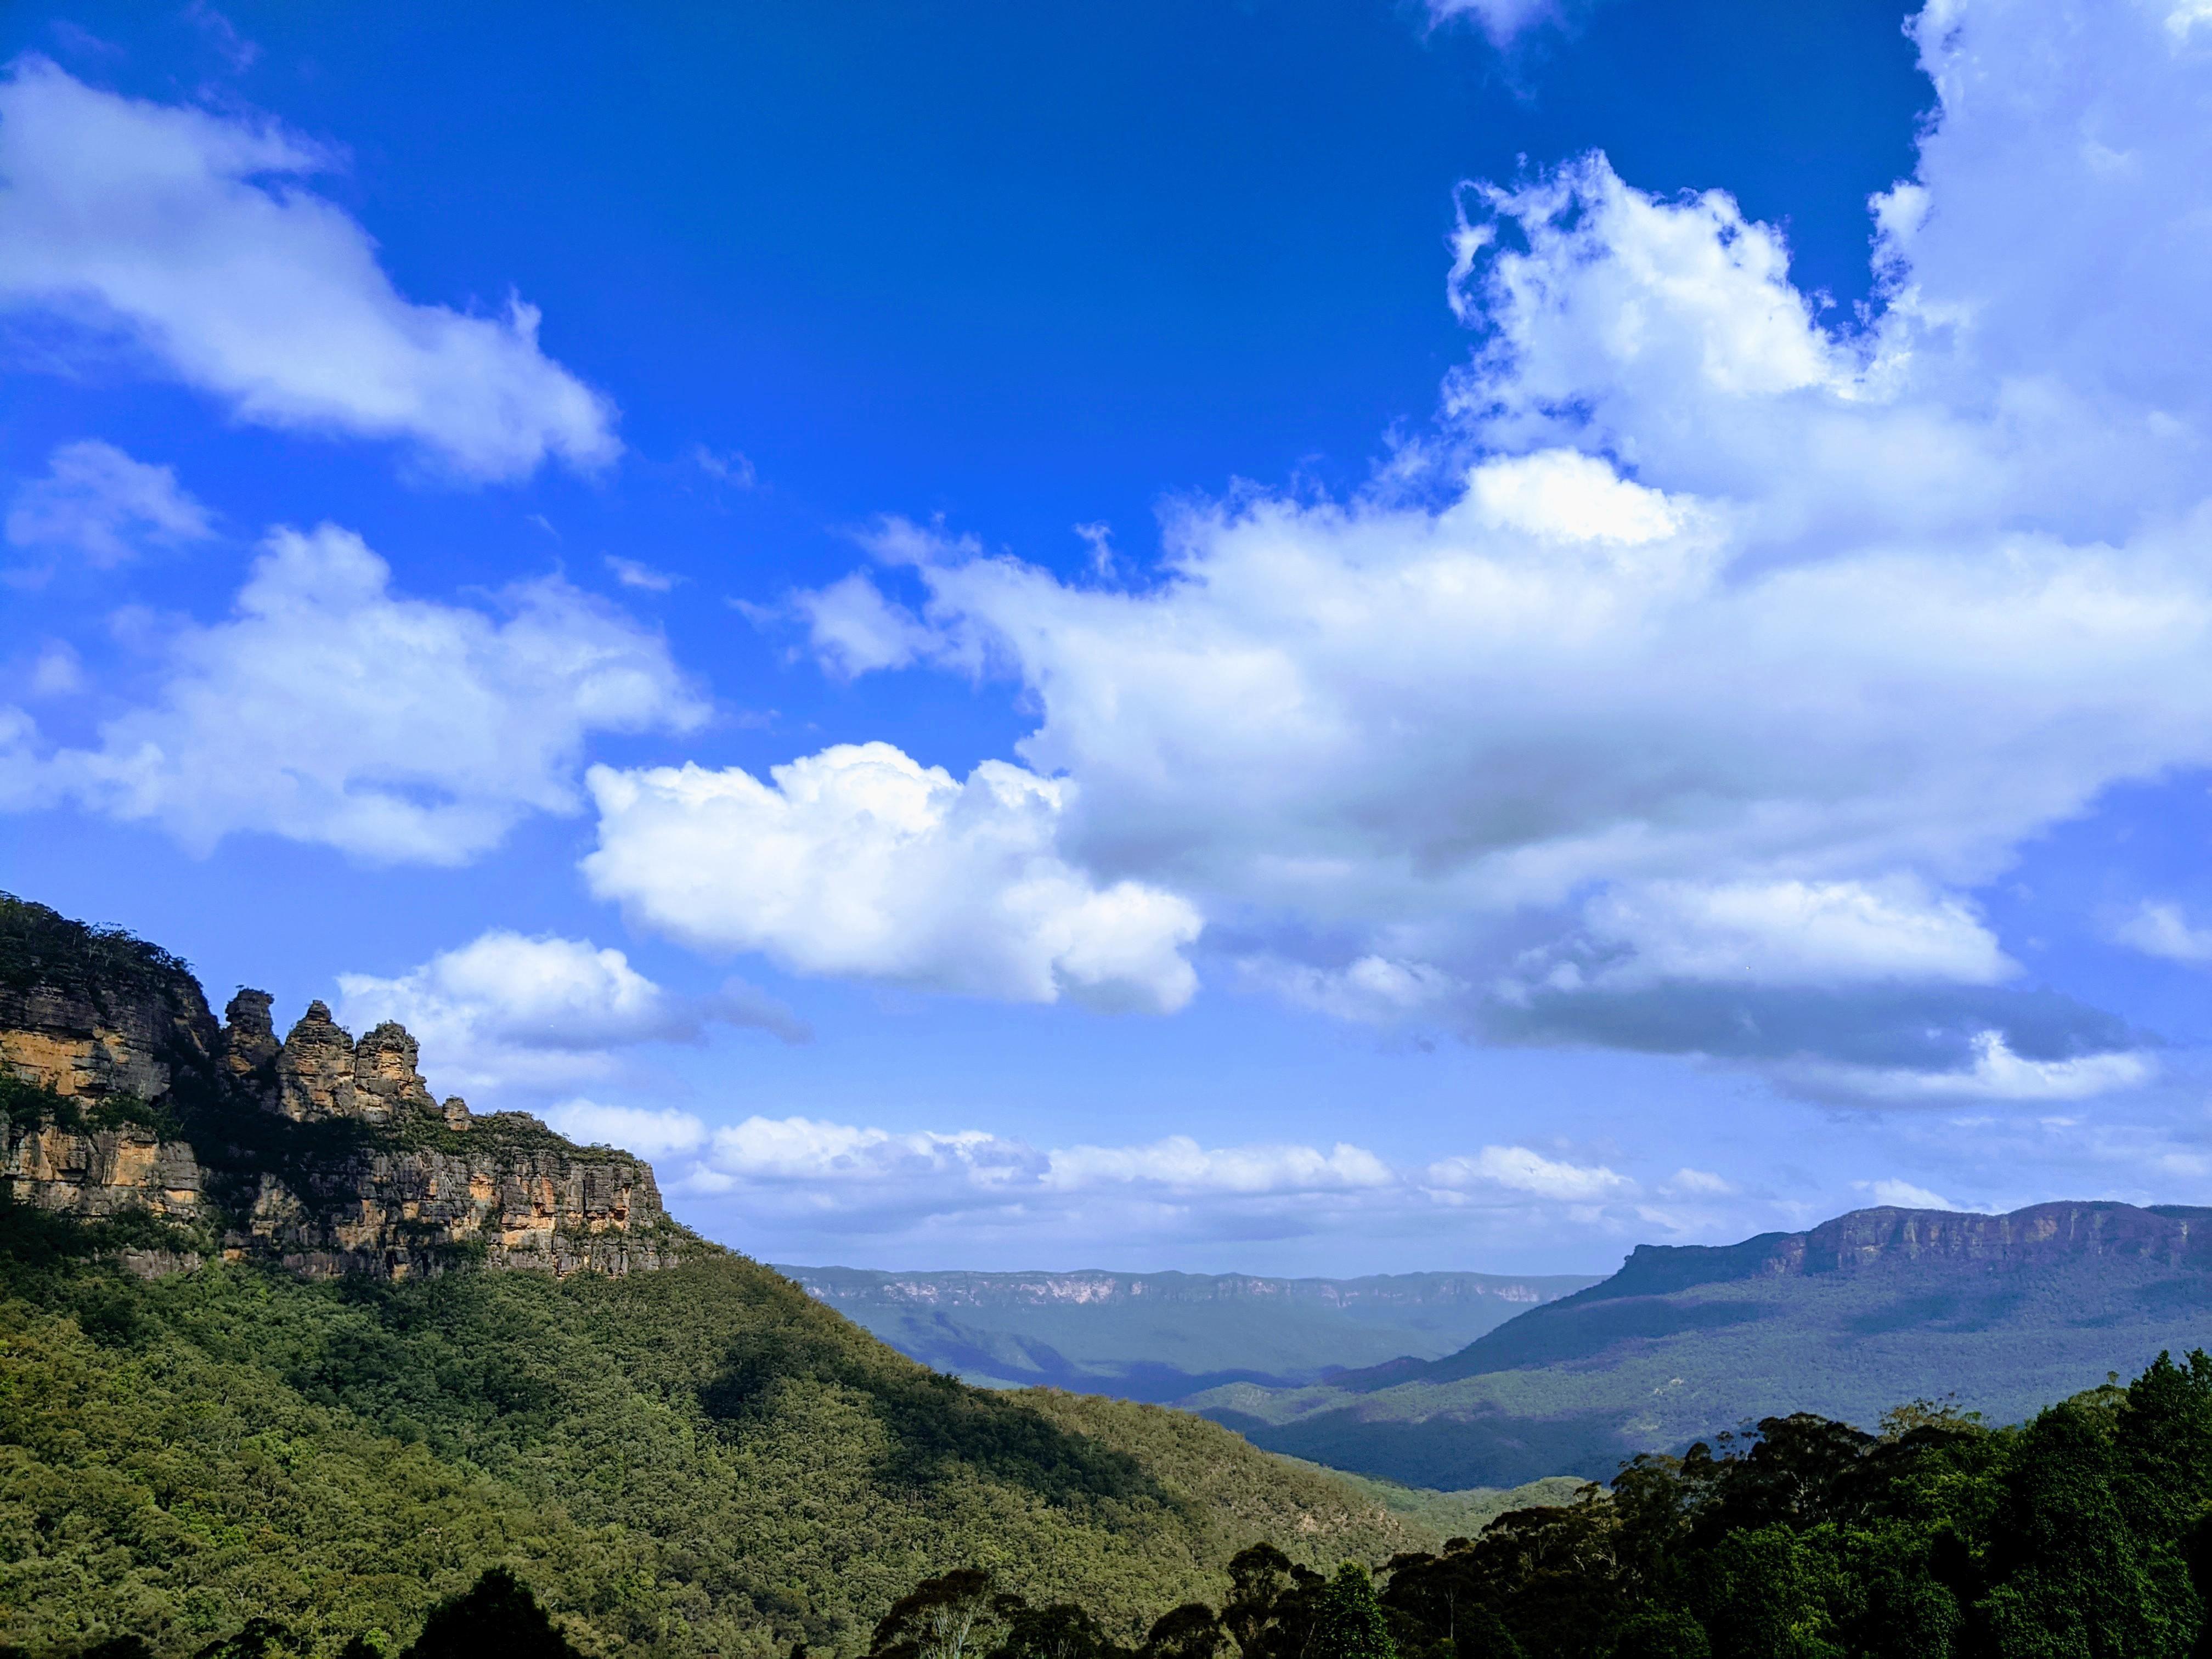 Blue Mountains Australia Oc 4032 X 3024 In 2020 Blue Mountains Australia Photography Kit Landscape Photography